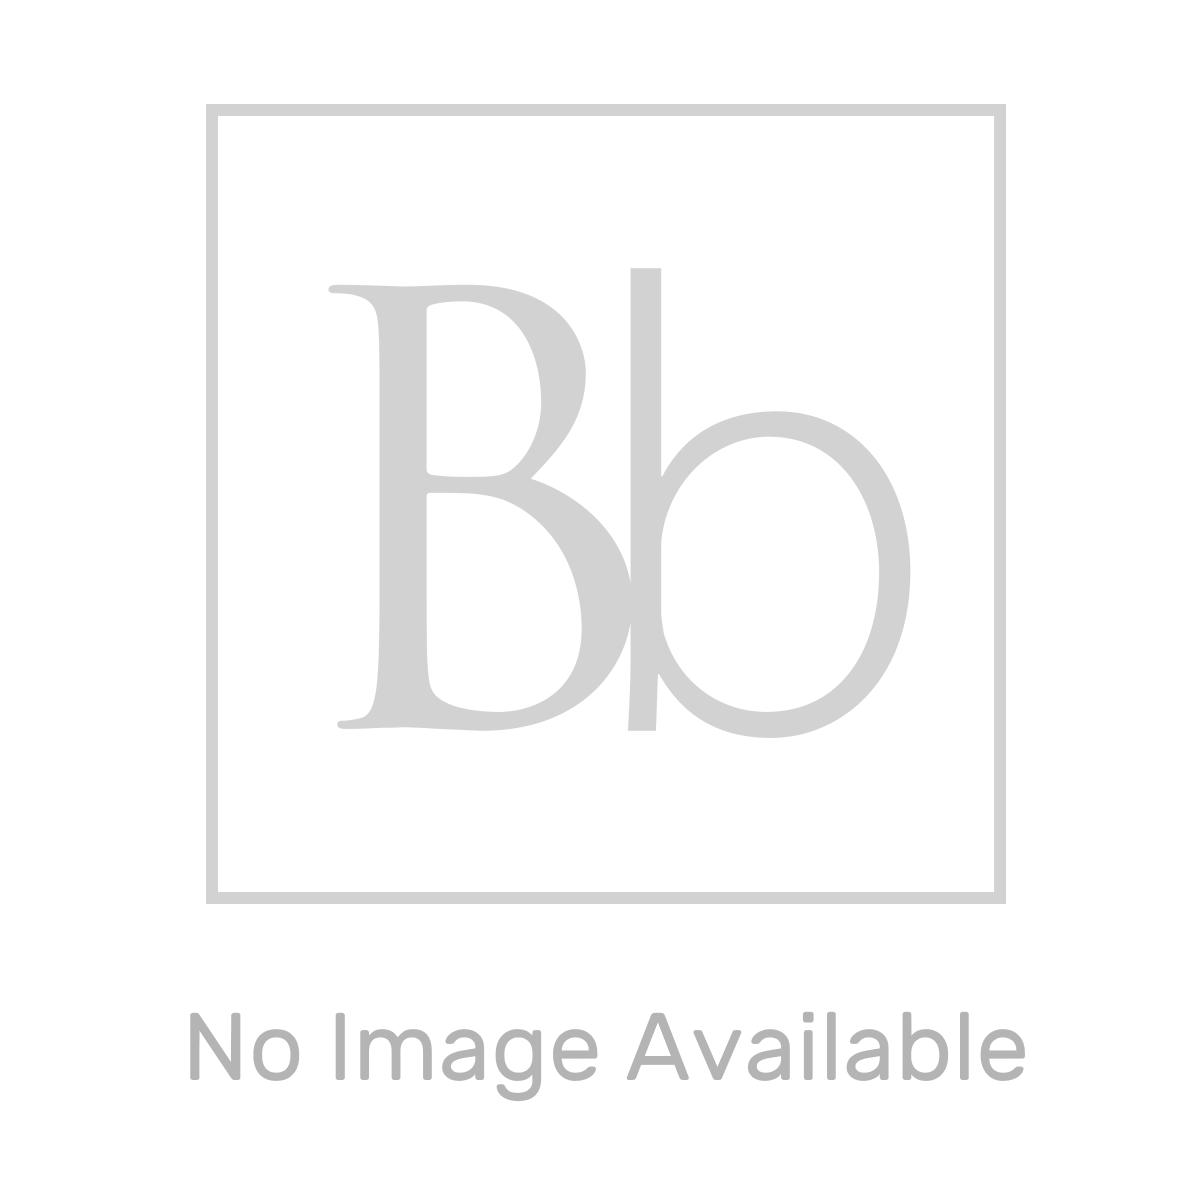 Cistermiser Standard Automatic Urinal Flush Control Valve with Hygiene Flush